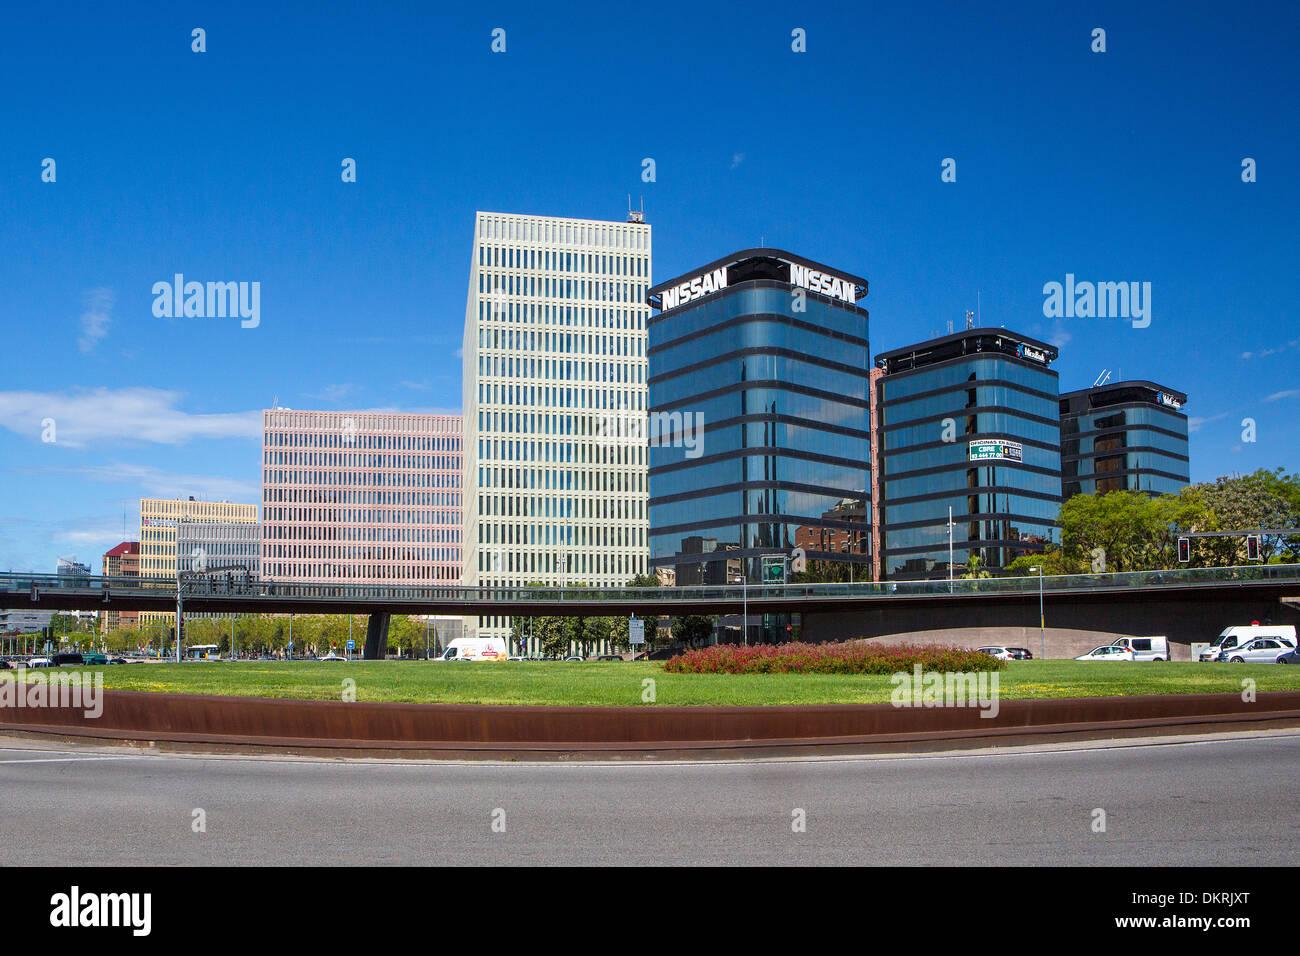 Cerda, Justice, architecture, Barcelona, building, Catalonia, city, new, Spain, Europe, square - Stock Image